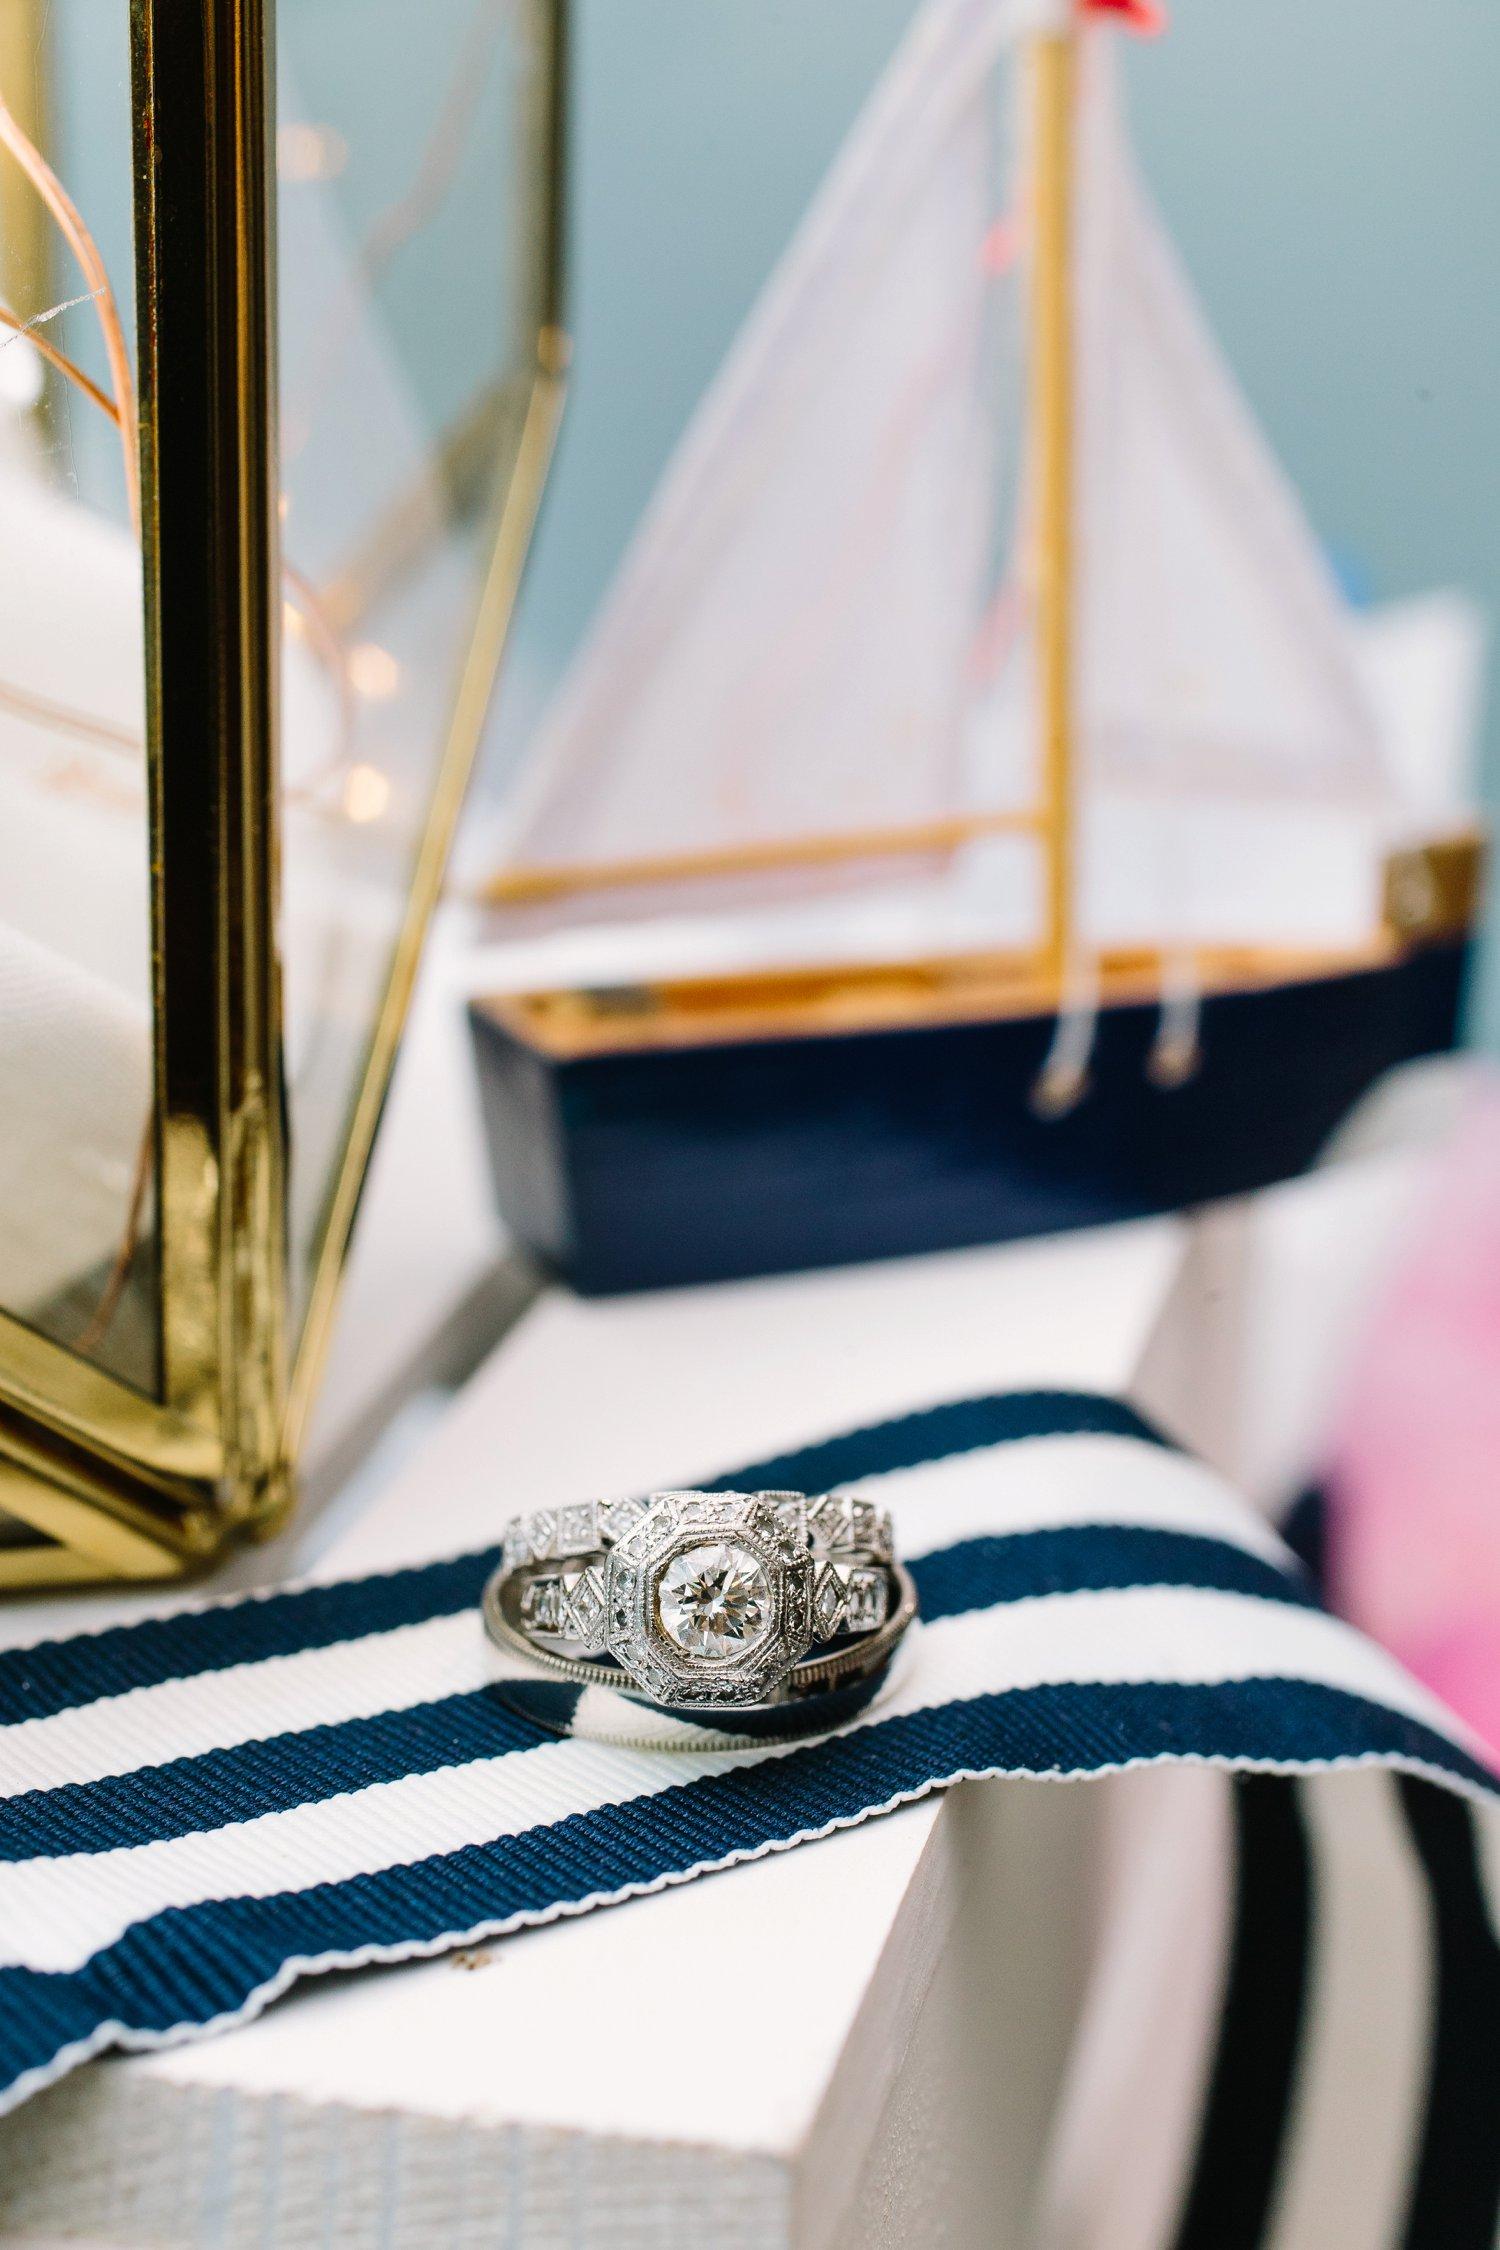 Lindsey_A_Miller_Photography_wedding_southport_community_building_bubbly_events_north_carolina_coasta_cannon_nautical_historic_012.jpg